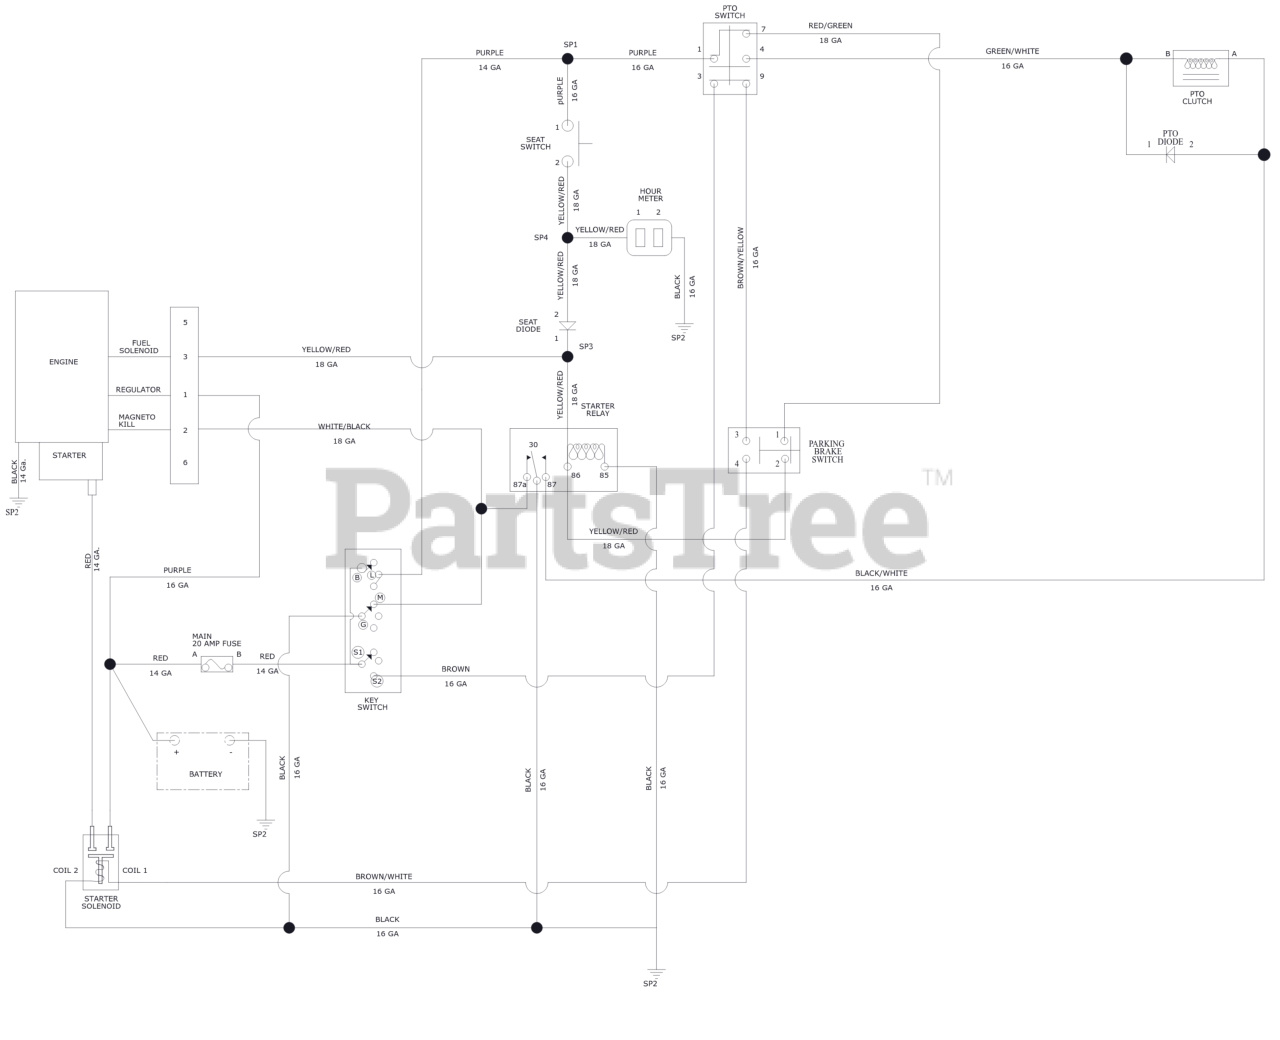 Ariens 915253 Ariens Edge 42 Zero Turn Mower 20hp Briggs Stratton Sn 000101 Above Wiring Diagram Parts Lookup With Diagrams Partstree